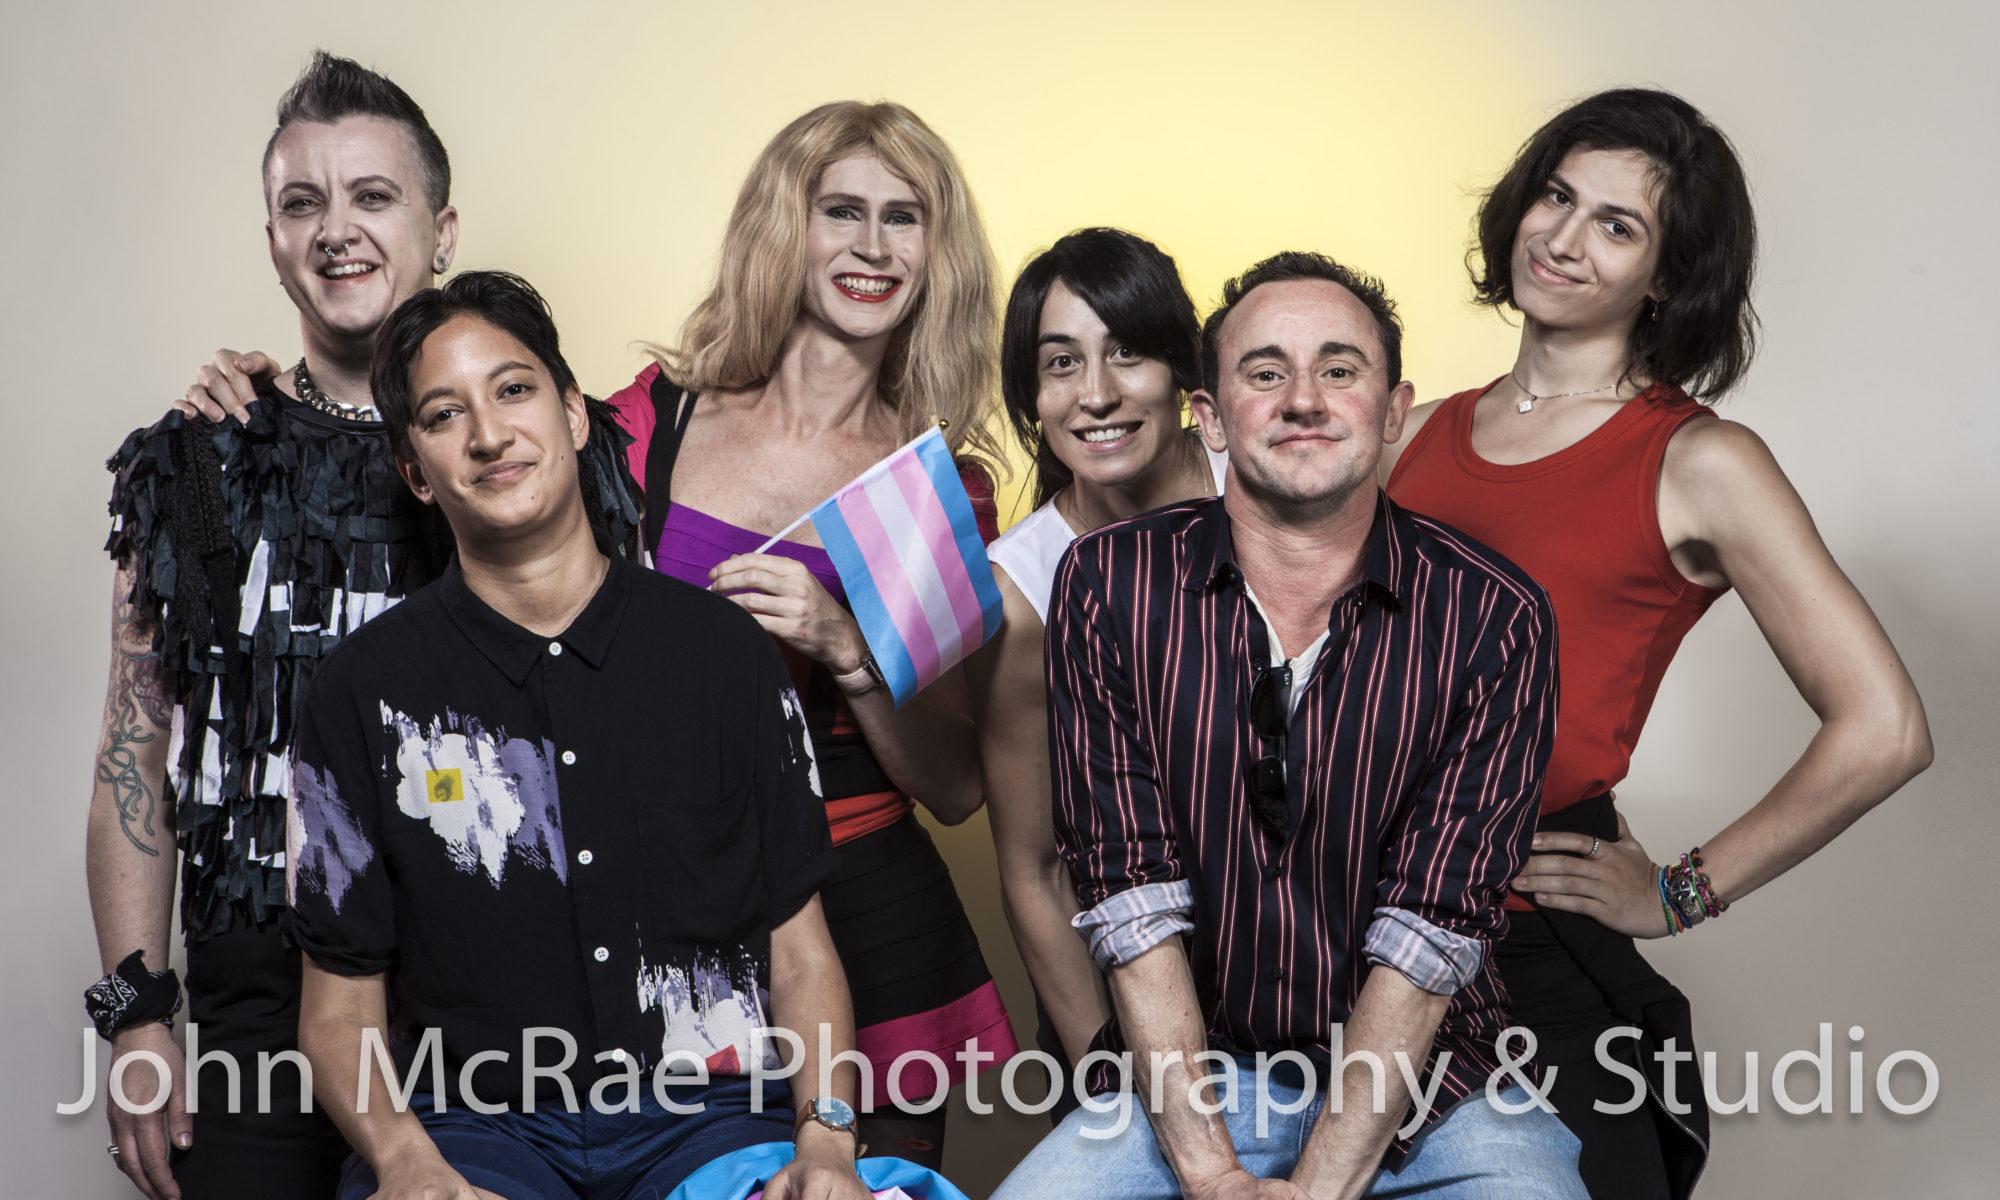 John McRae Photography & Studio